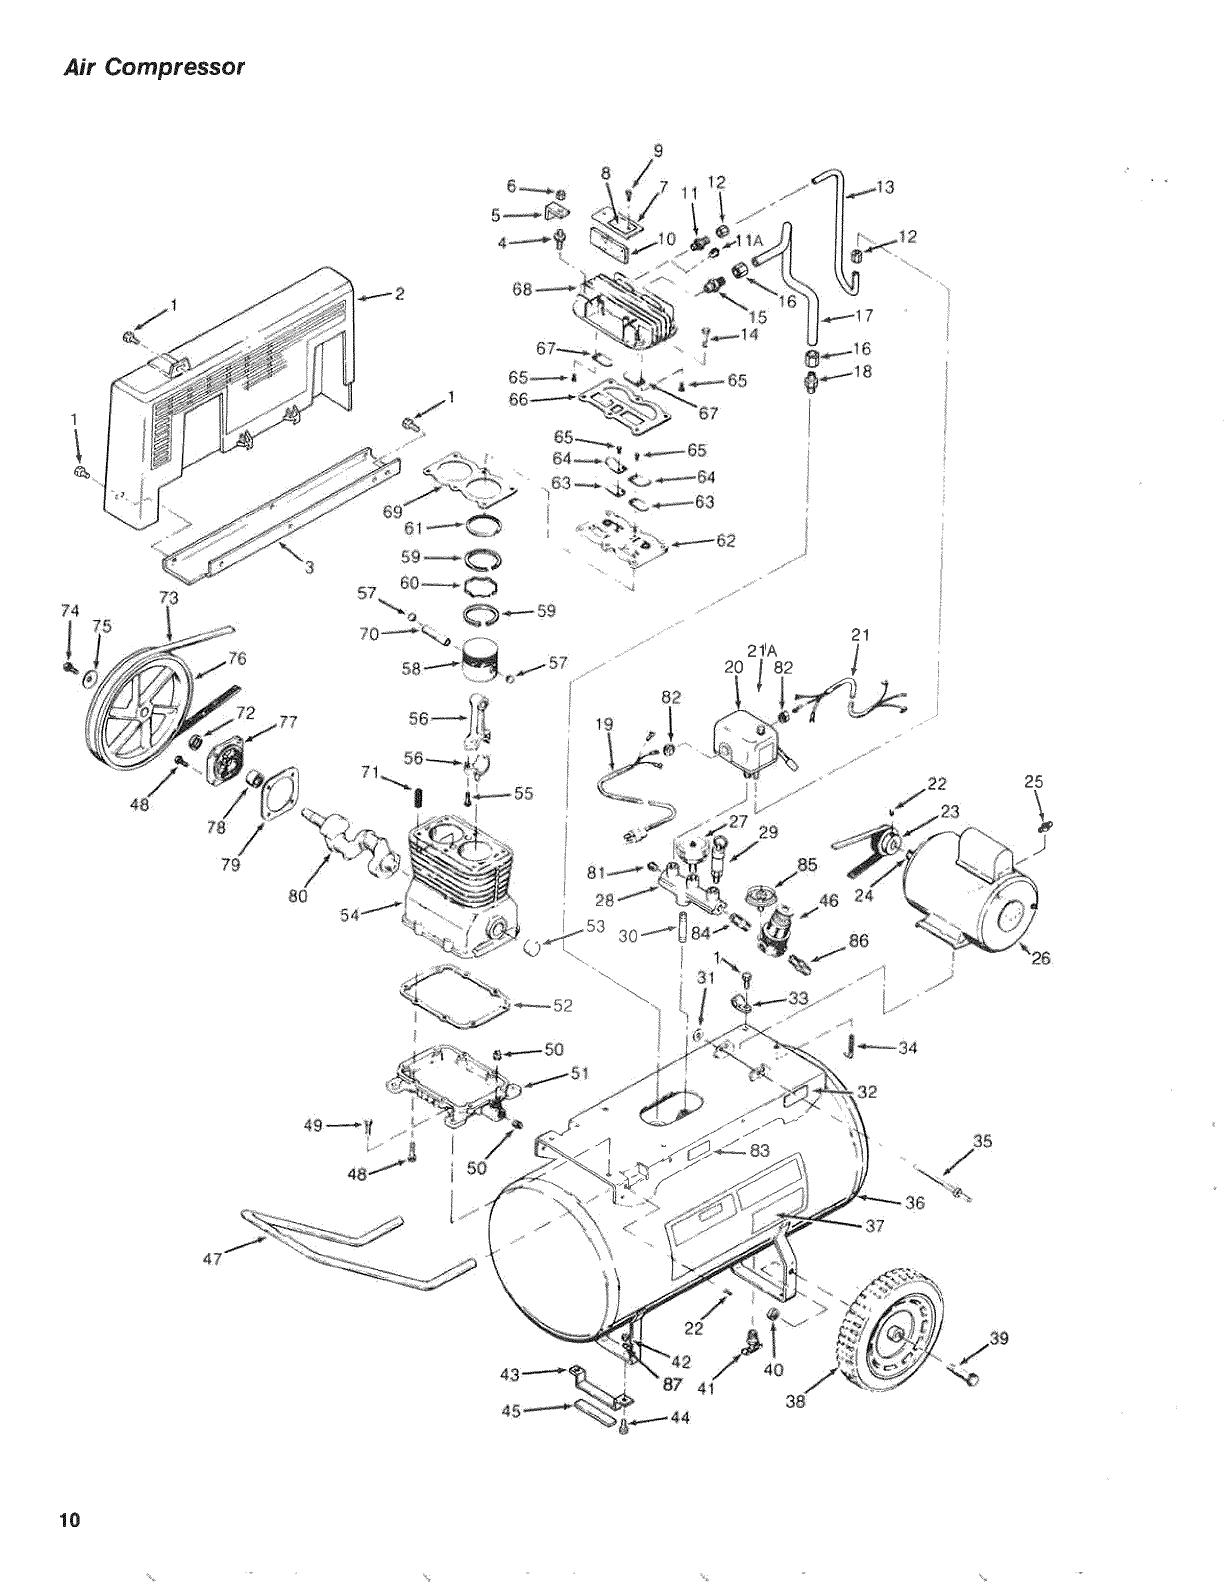 Craftsman 919174212 User Manual AIR COMPRESSOR Manuals And